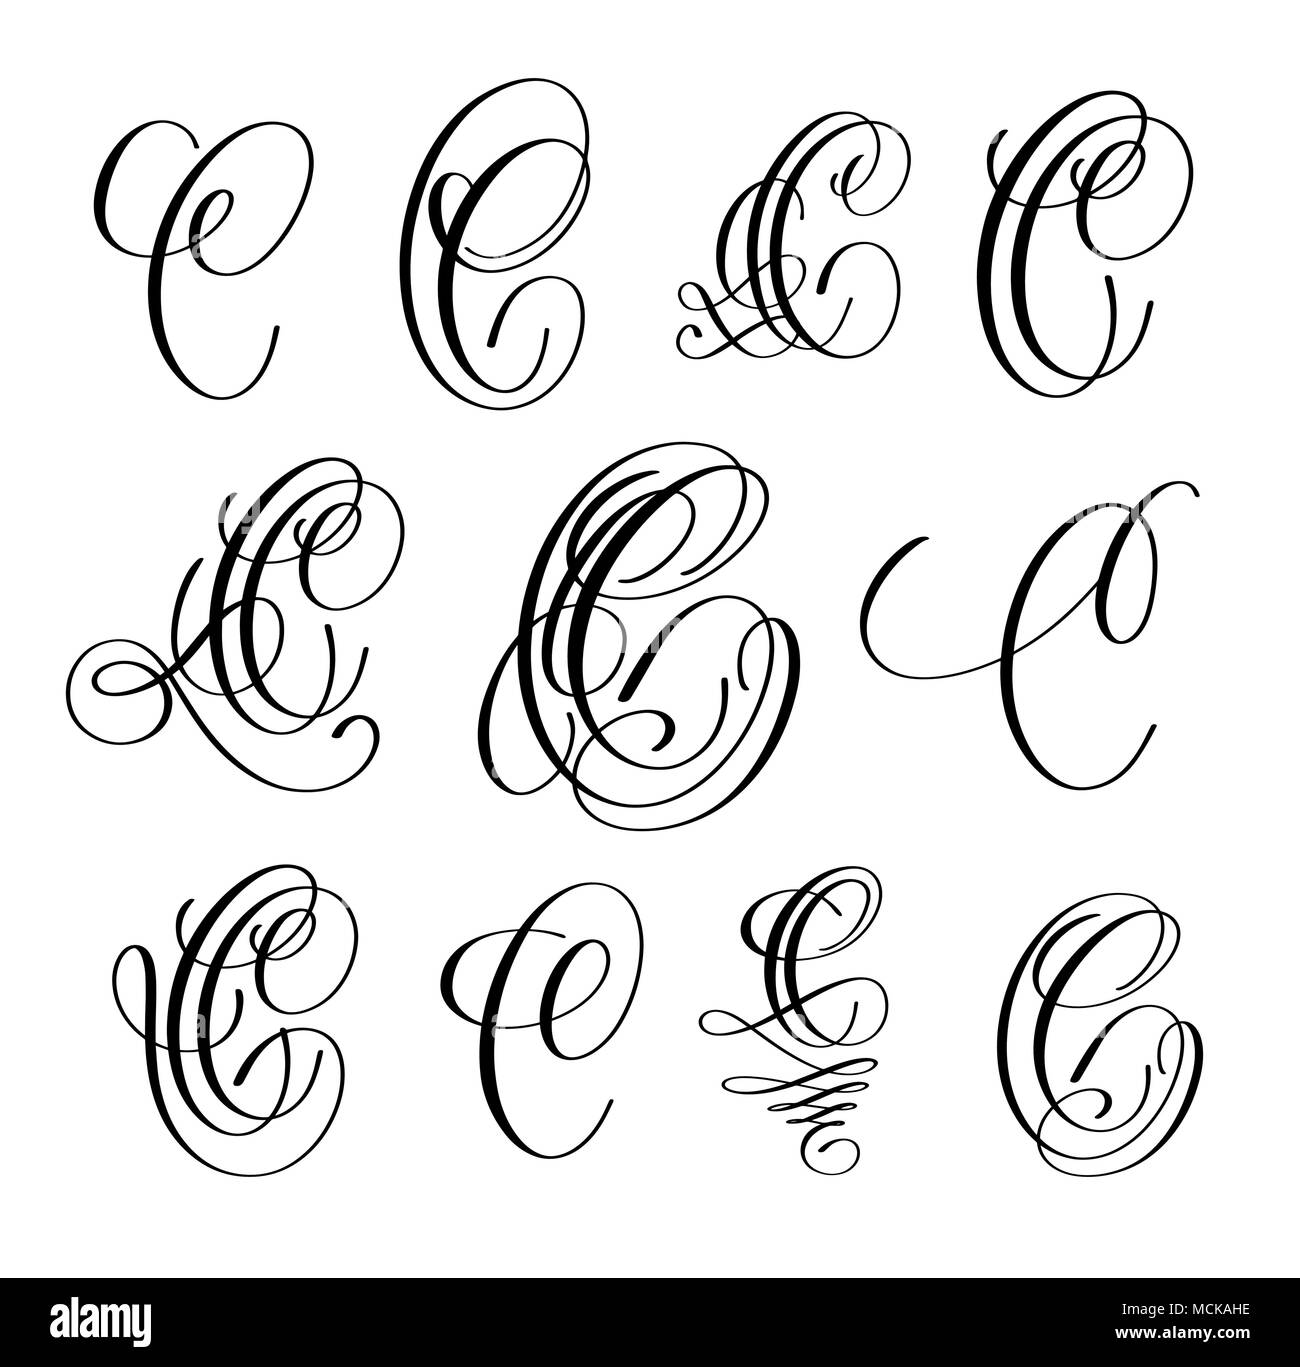 Calligraphy Lettering Script Font C Set Hand Written Signature Letter Design Vector Illustration